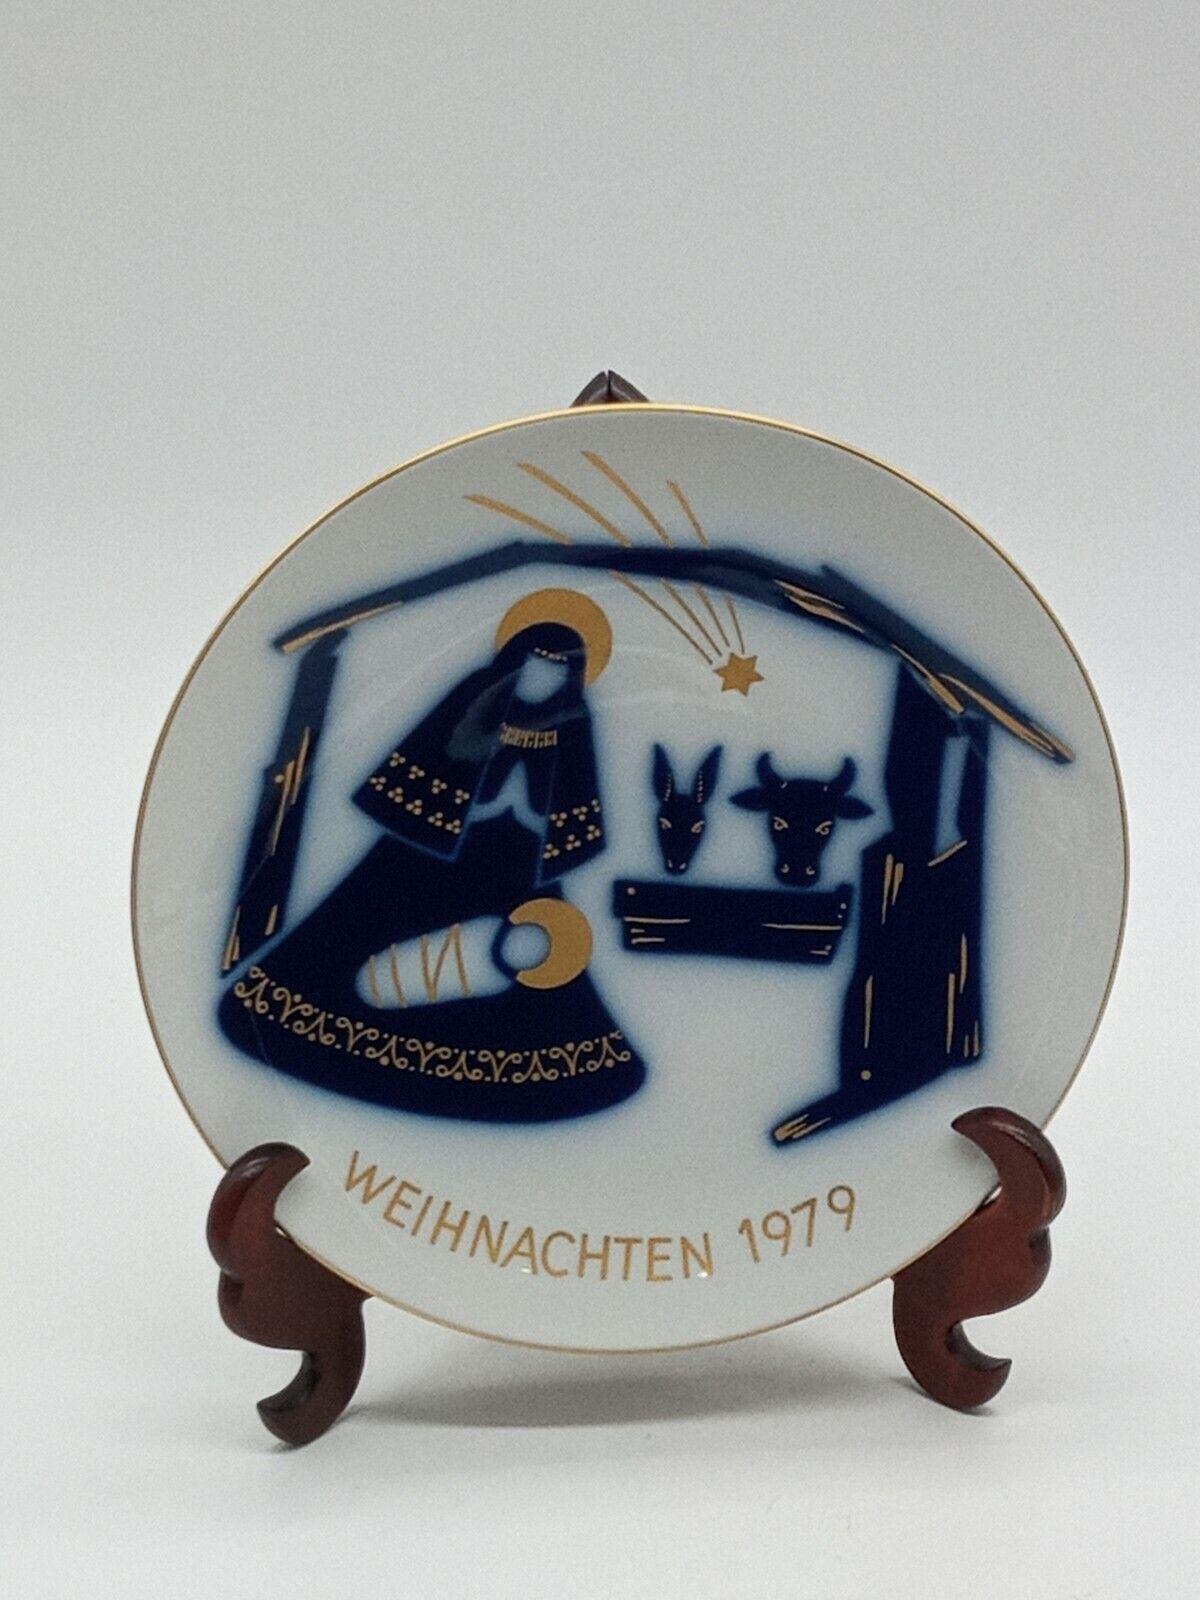 Image 1 - NICE-KPM-Wall-Plate-Limited-Edition-Christmas-1979-Diameter-19-5cm